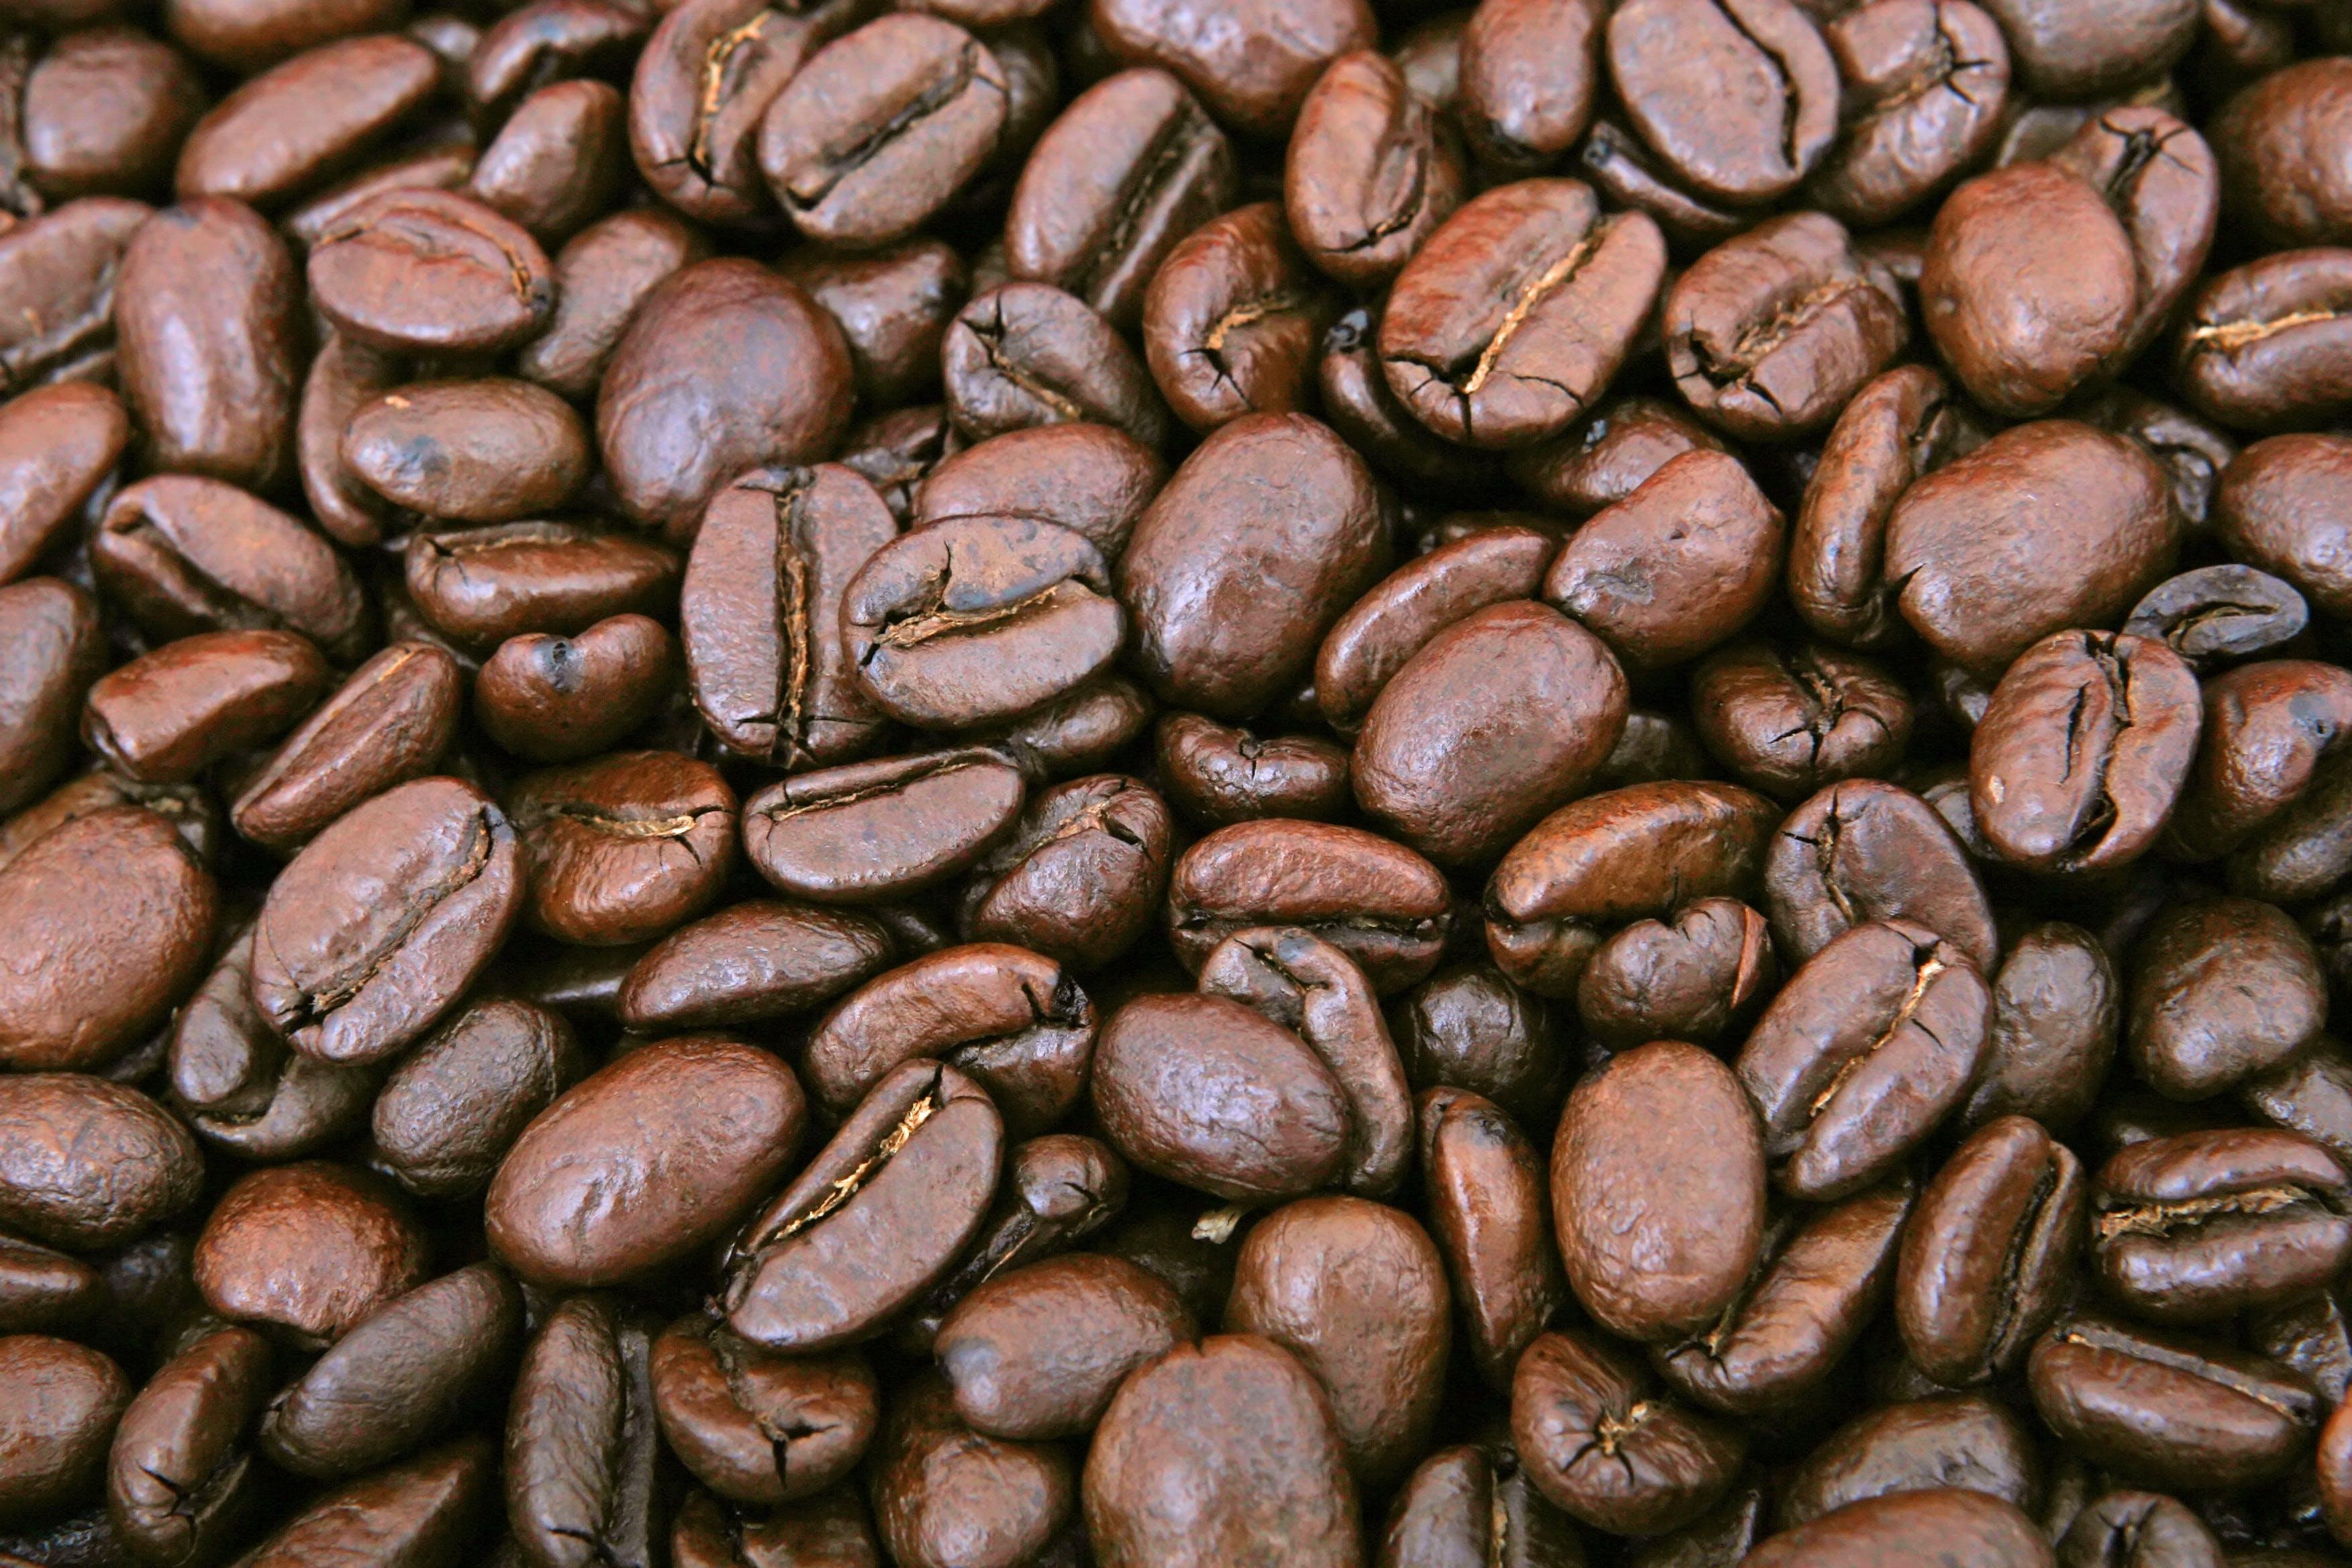 Pile of Coffee Bean